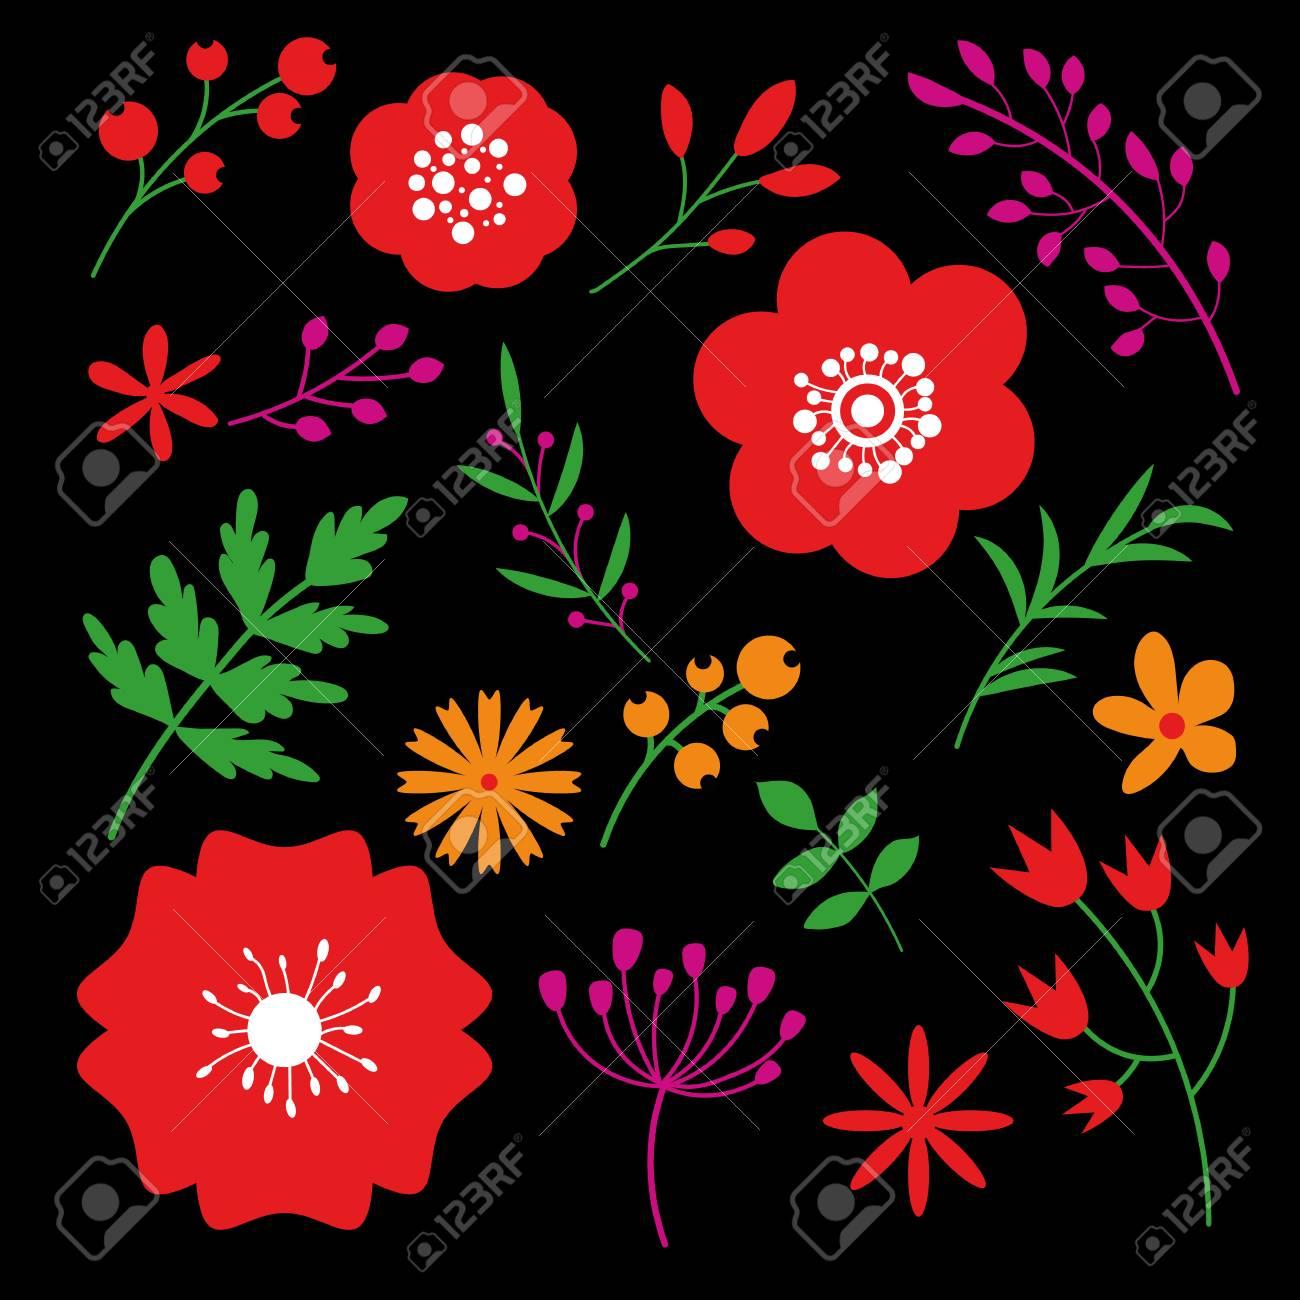 Floral Art Design On Black Background Beautiful Flowers Decorative